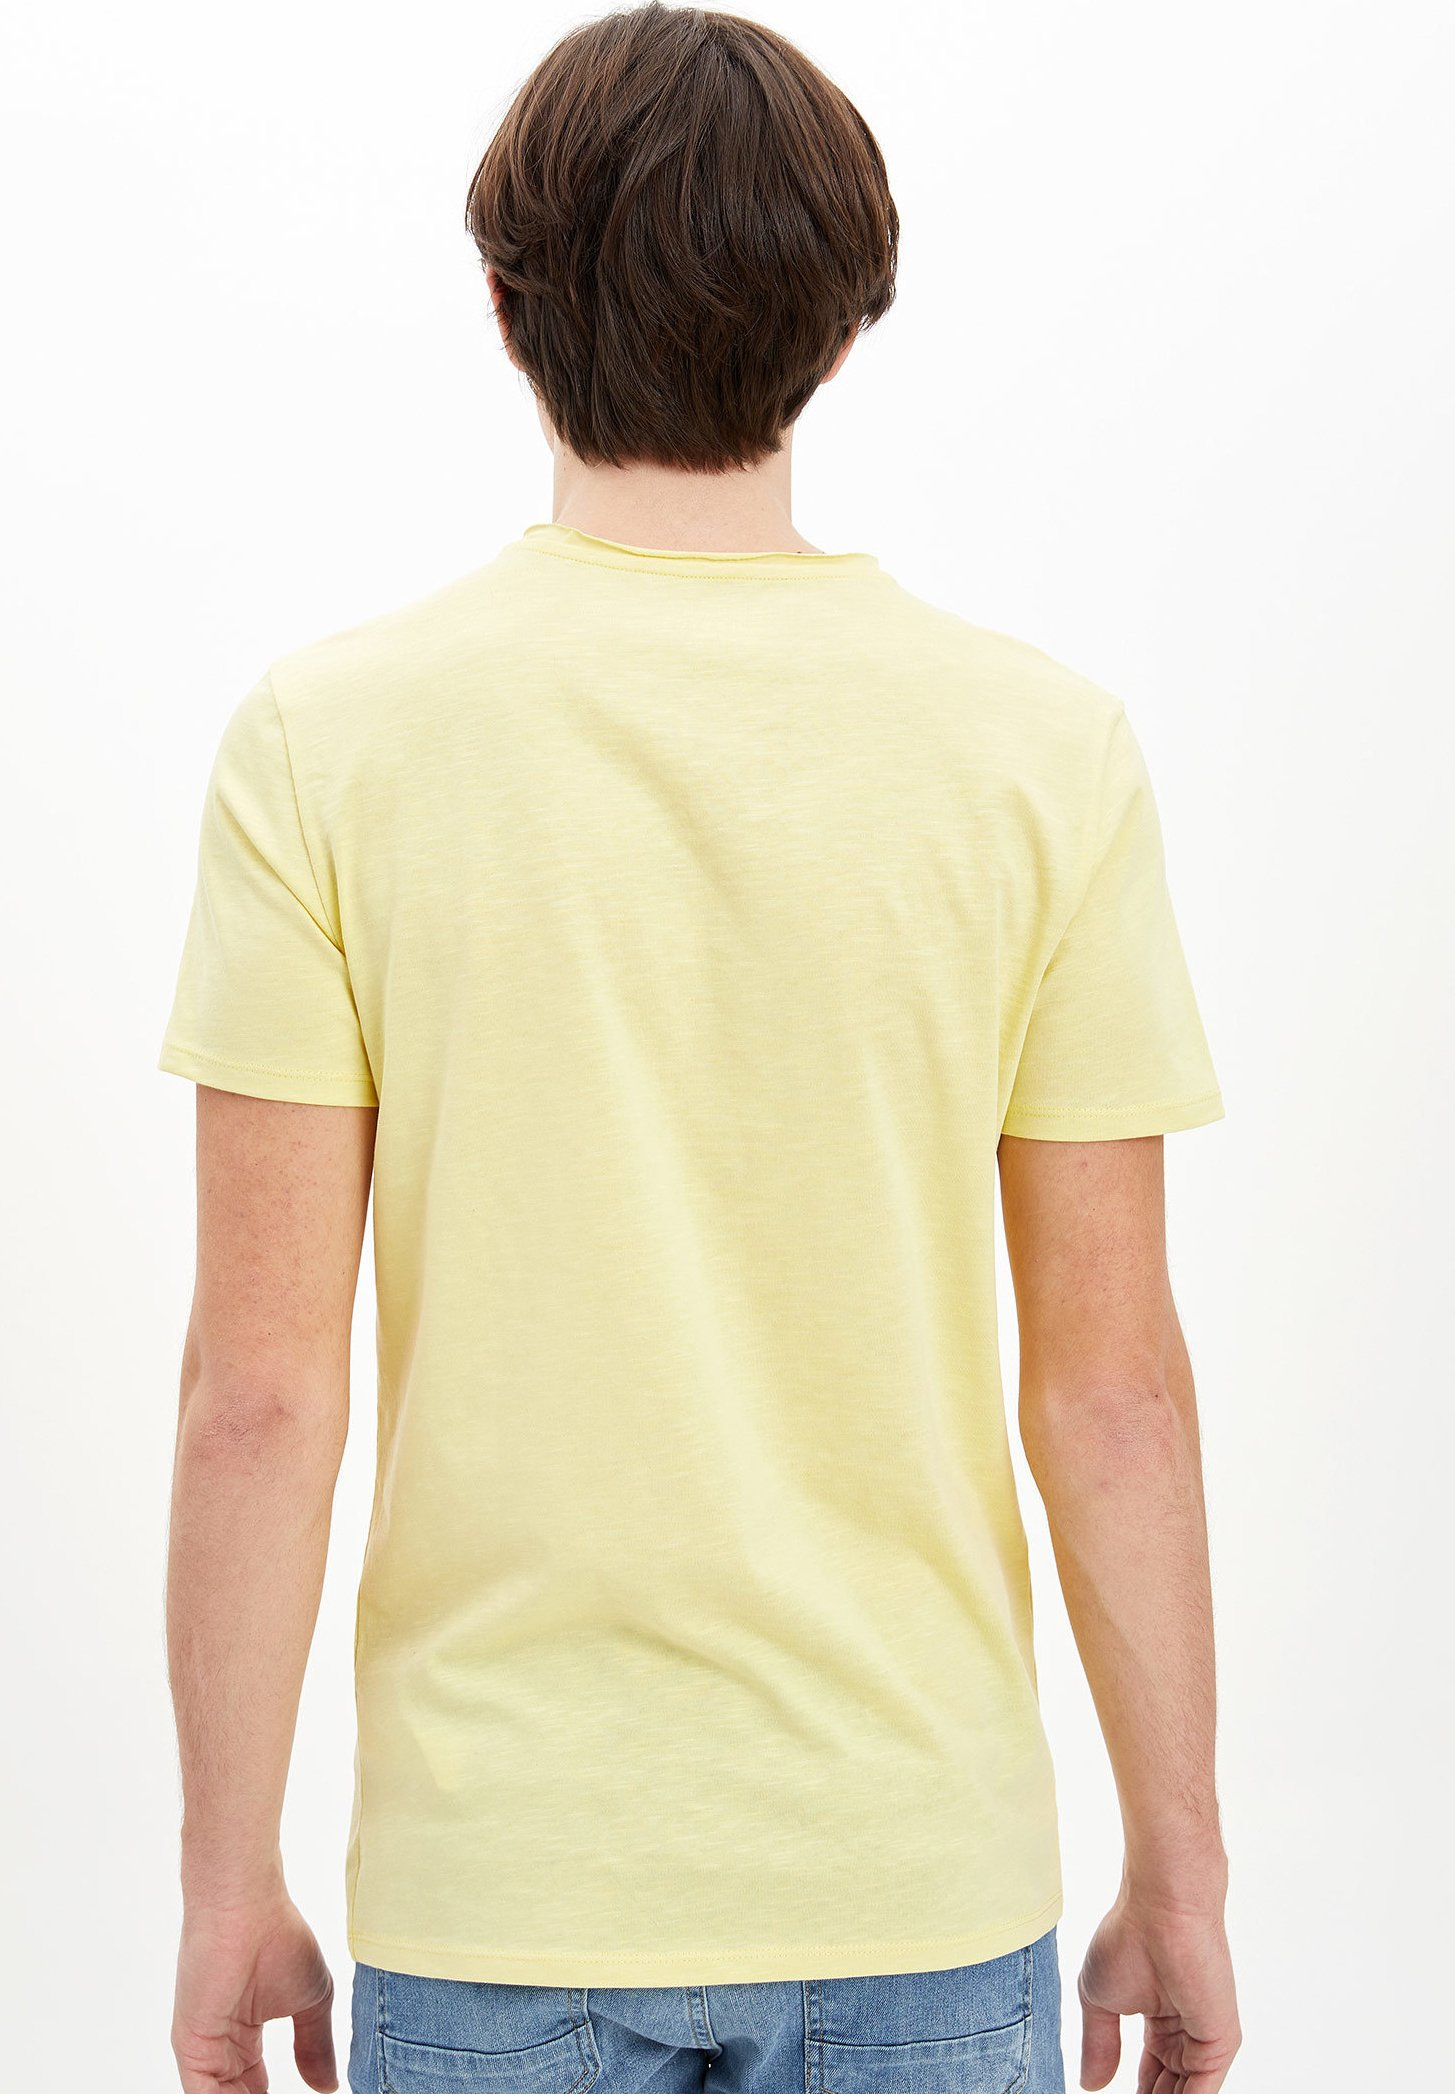 DeFacto Basic T-shirt - yellow sINTX